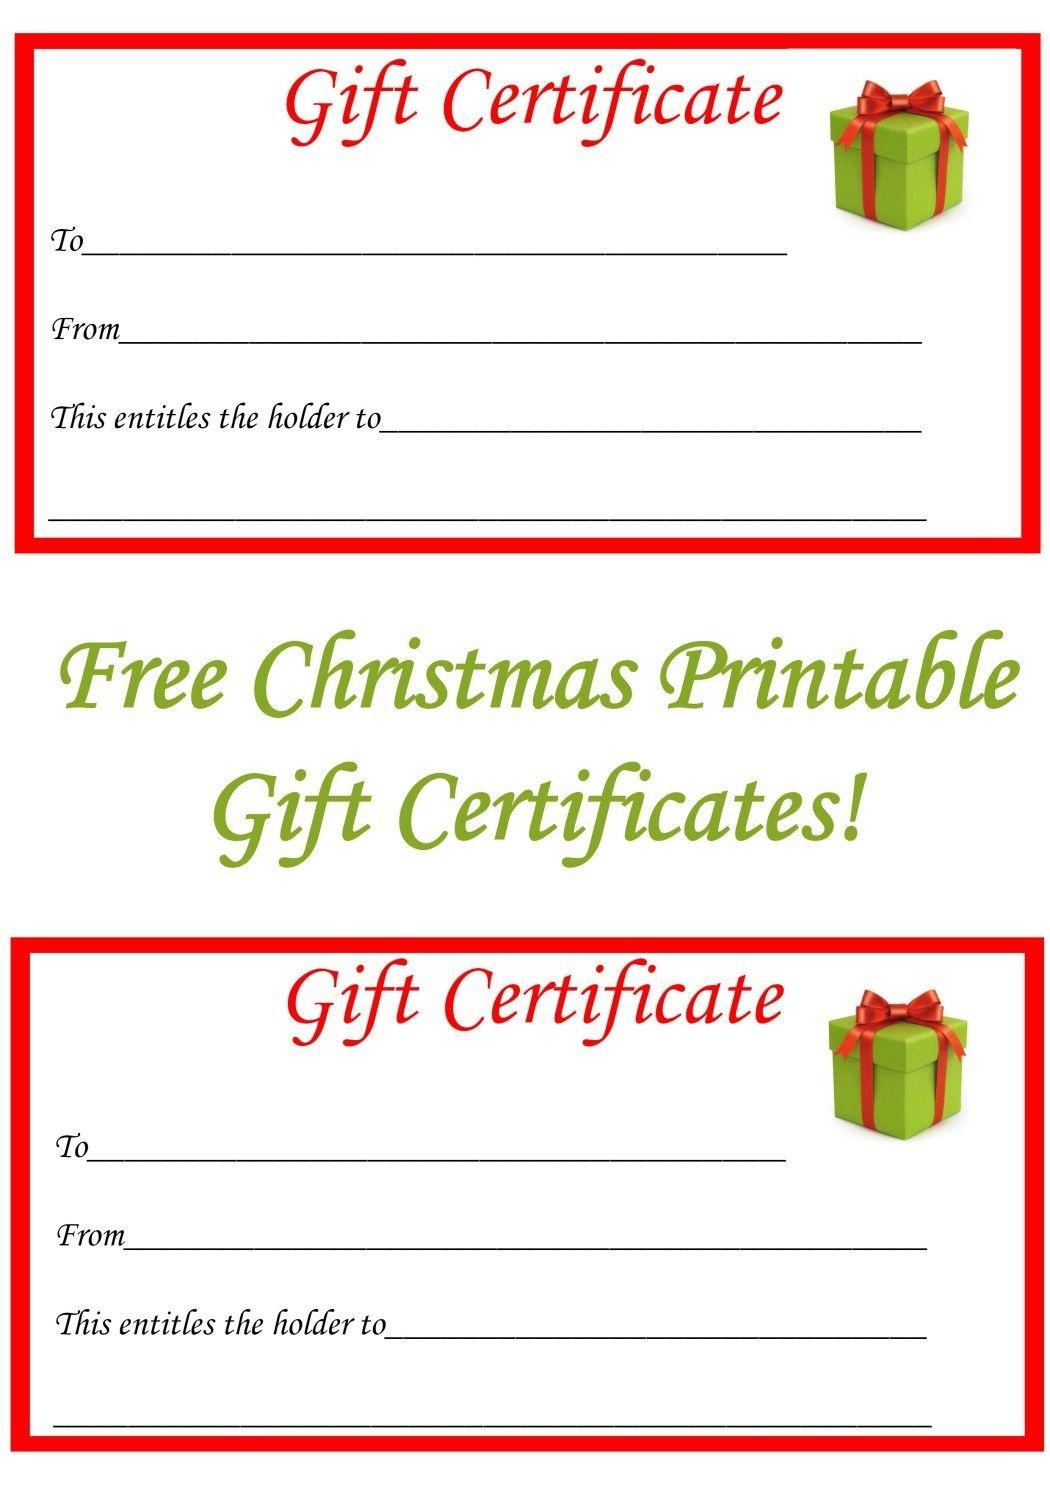 Free Christmas Printable Gift Certificates | Gift Ideas | Christmas - Free Printable Massage Gift Certificate Templates